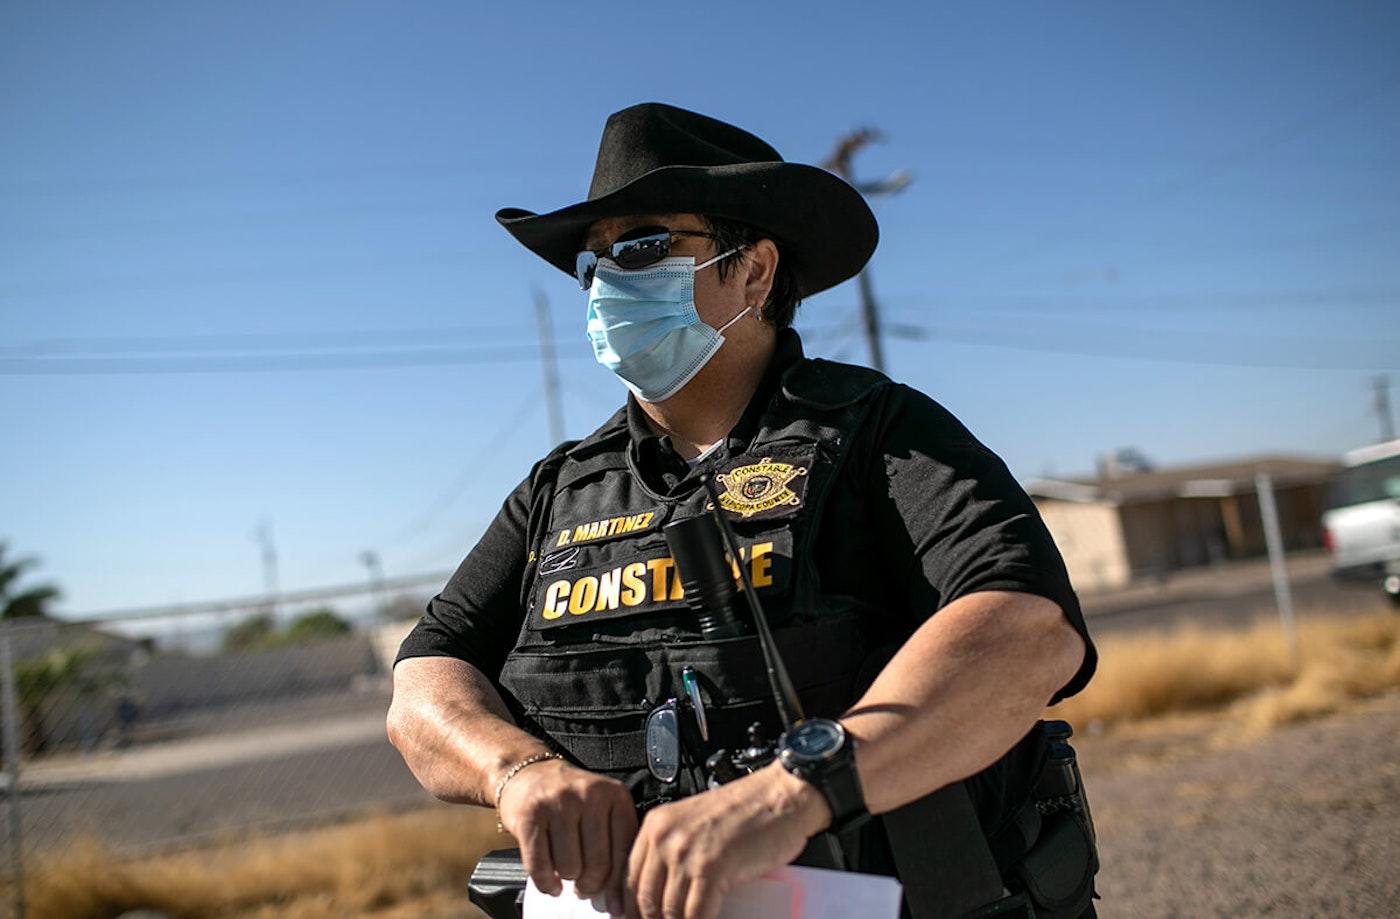 Constable Darlene Martinez in uniform